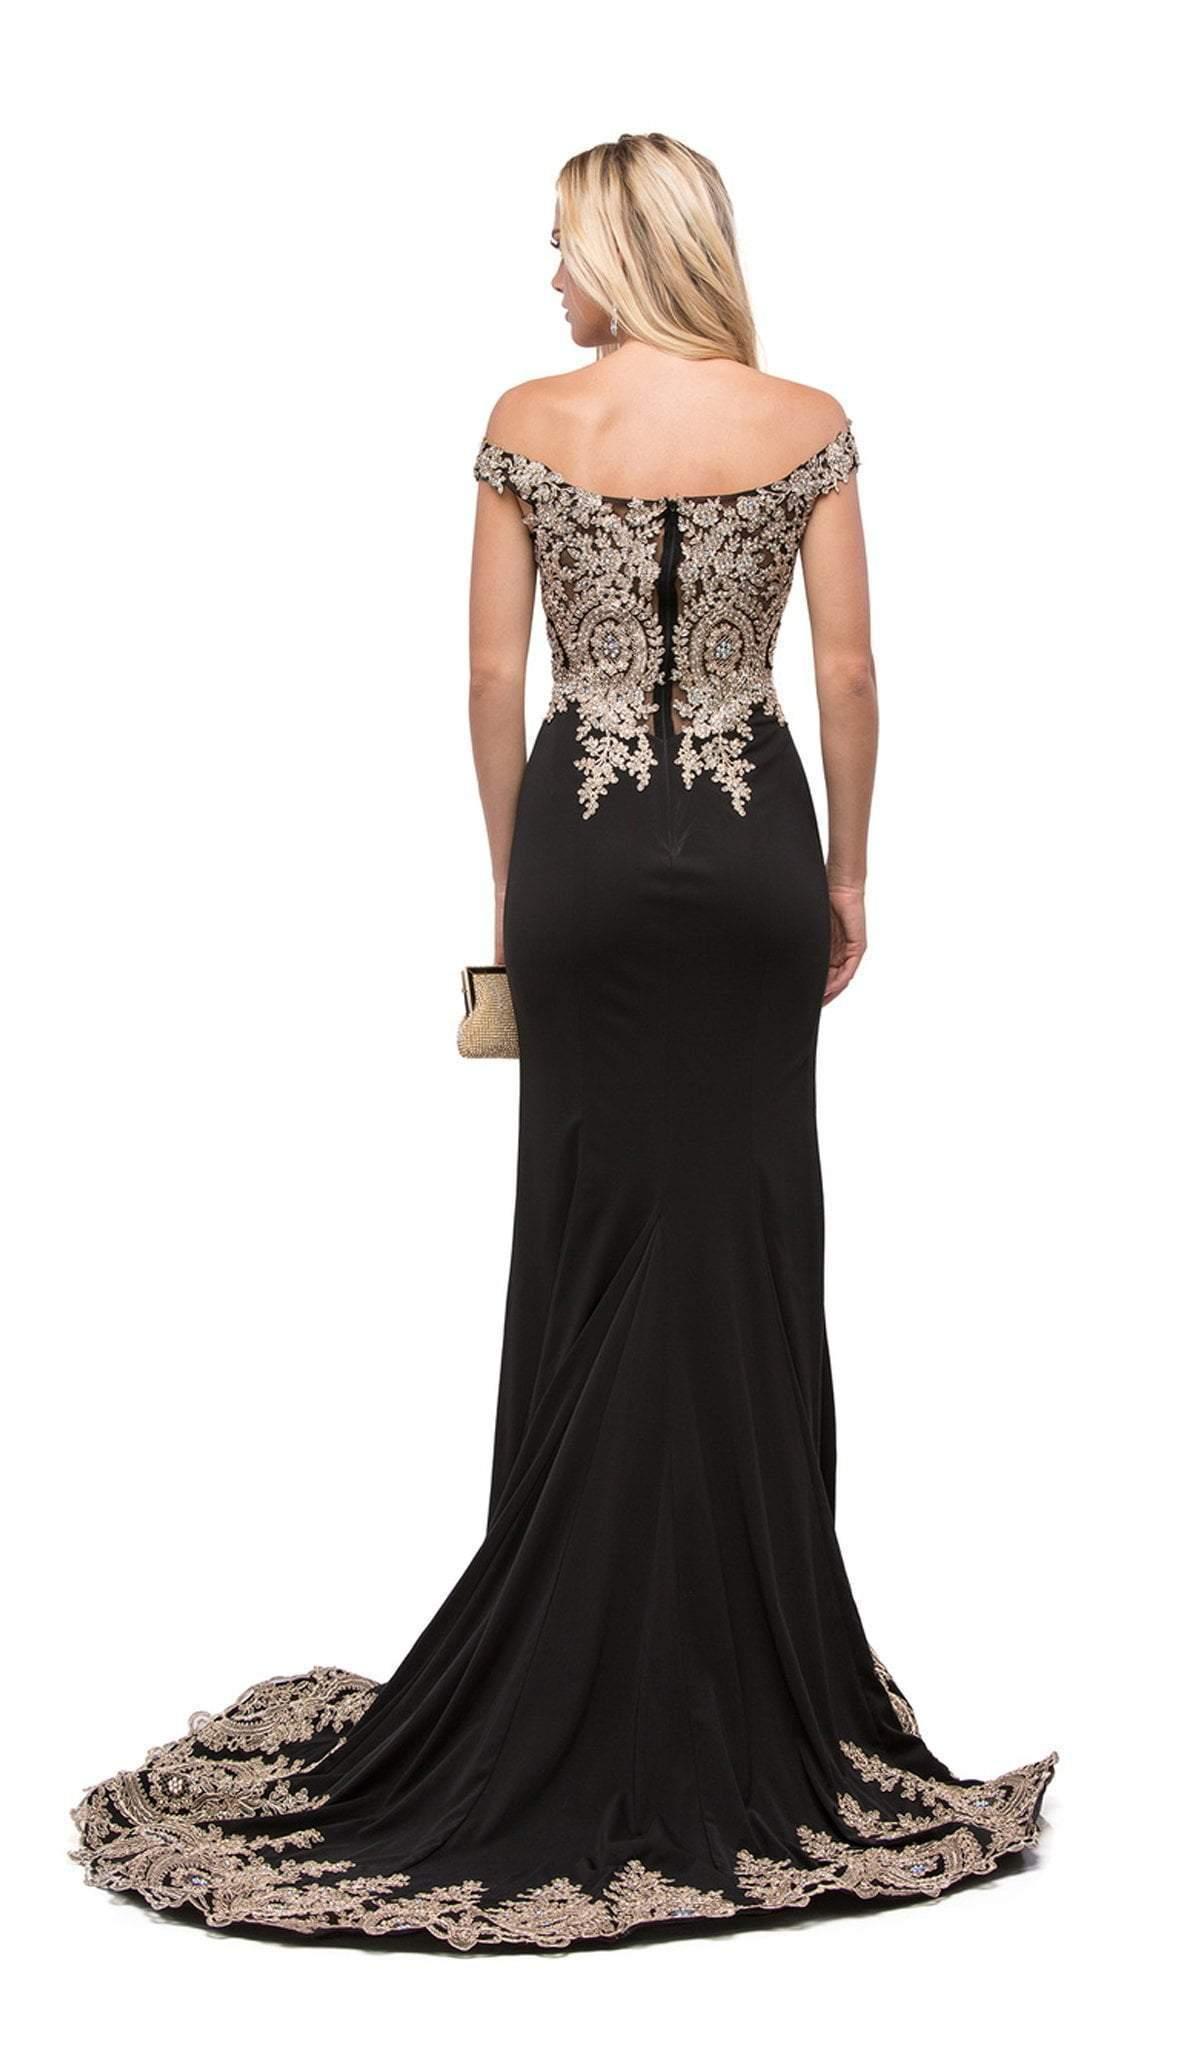 Dancing Queen - 9946 Embellished Off-Shoulder Evening Gown